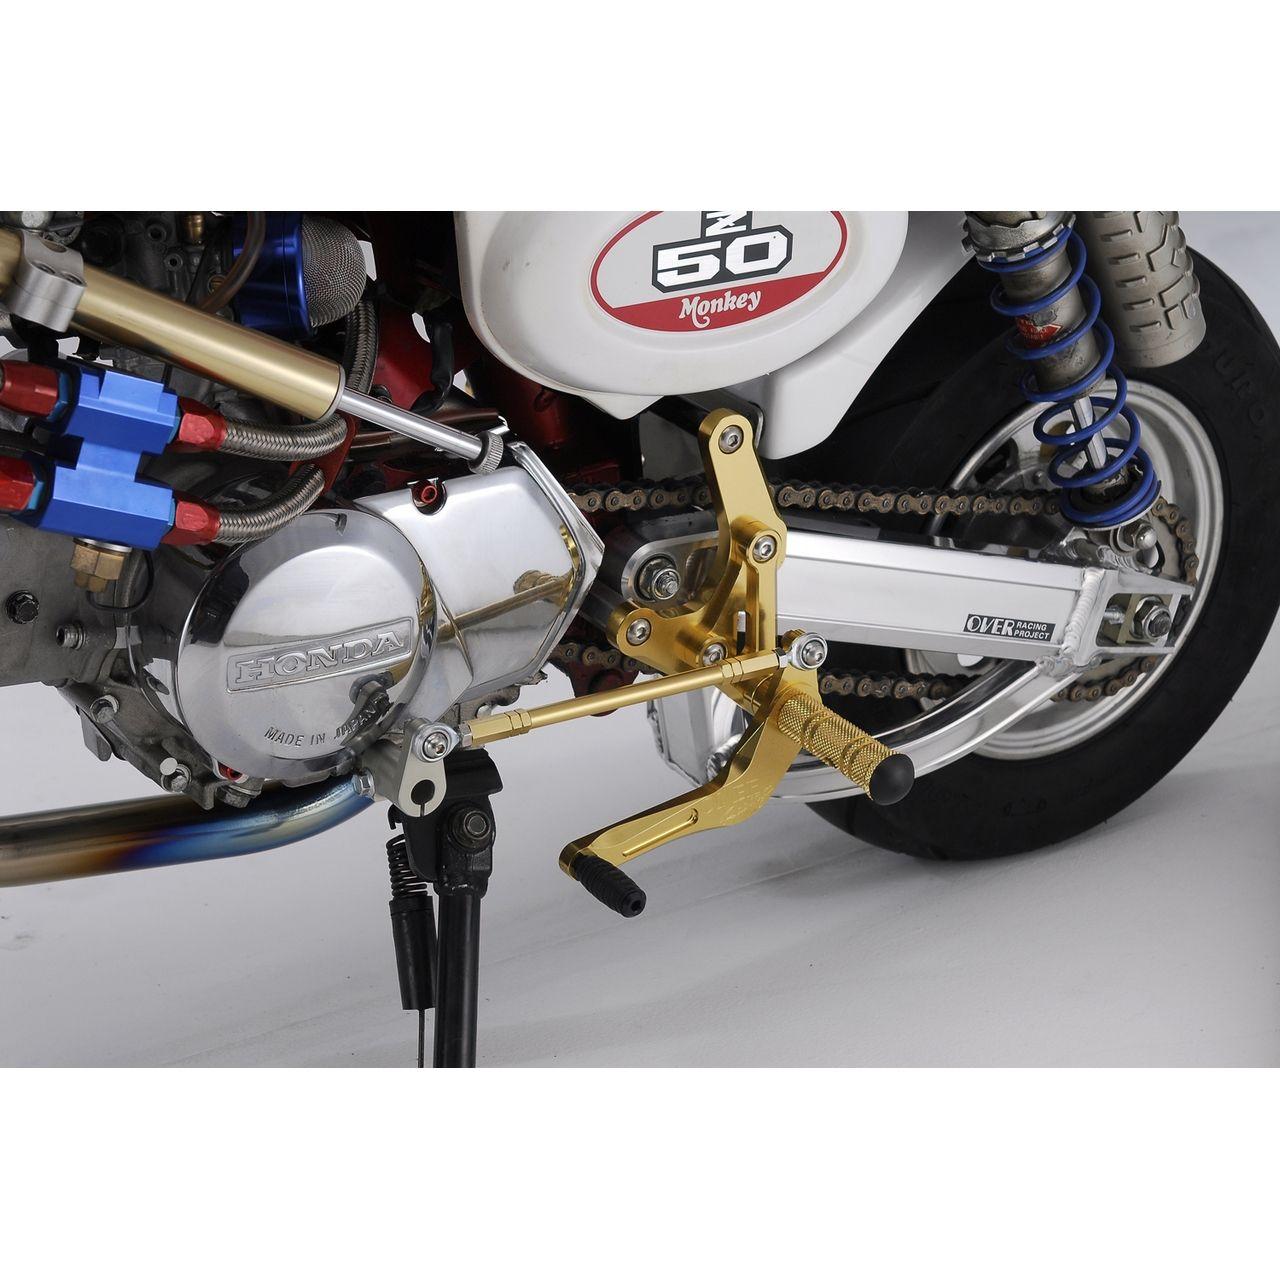 【OVER】腳踏後移套件競賽型 (後碟煞型式) - 「Webike-摩托百貨」